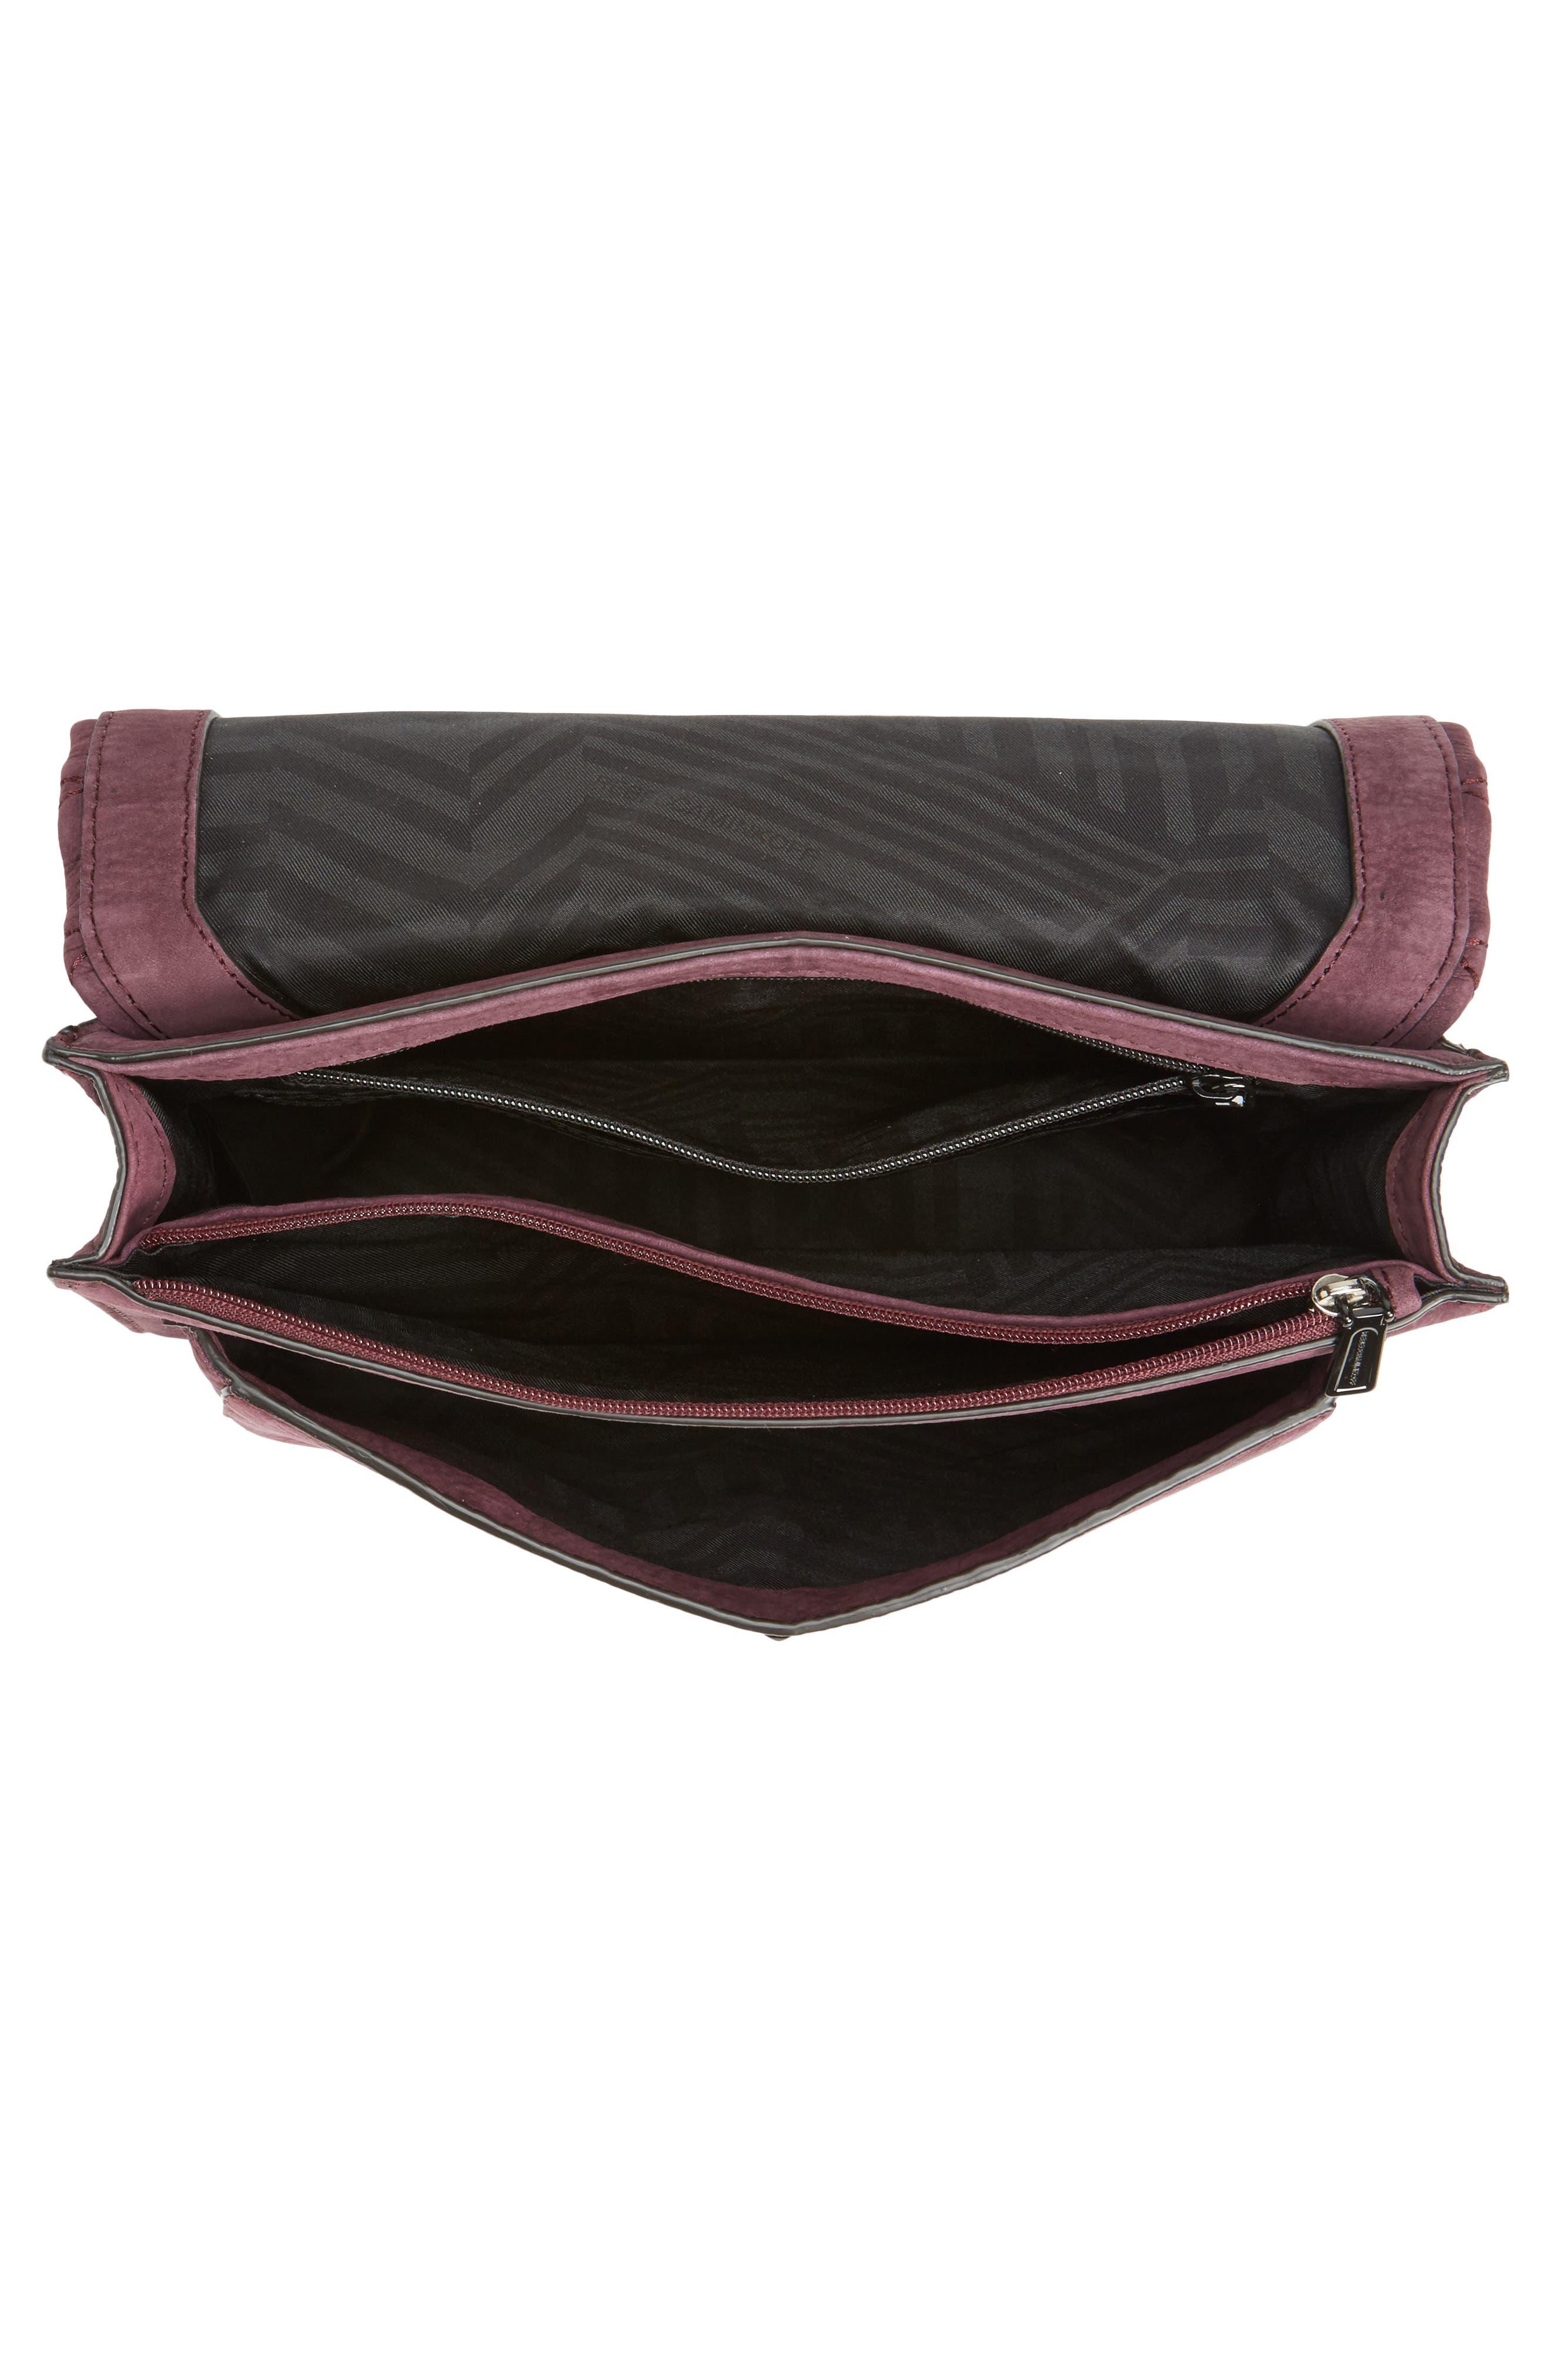 Medium Je T'aime Convertible Leather Crossbody Bag,                             Alternate thumbnail 36, color,